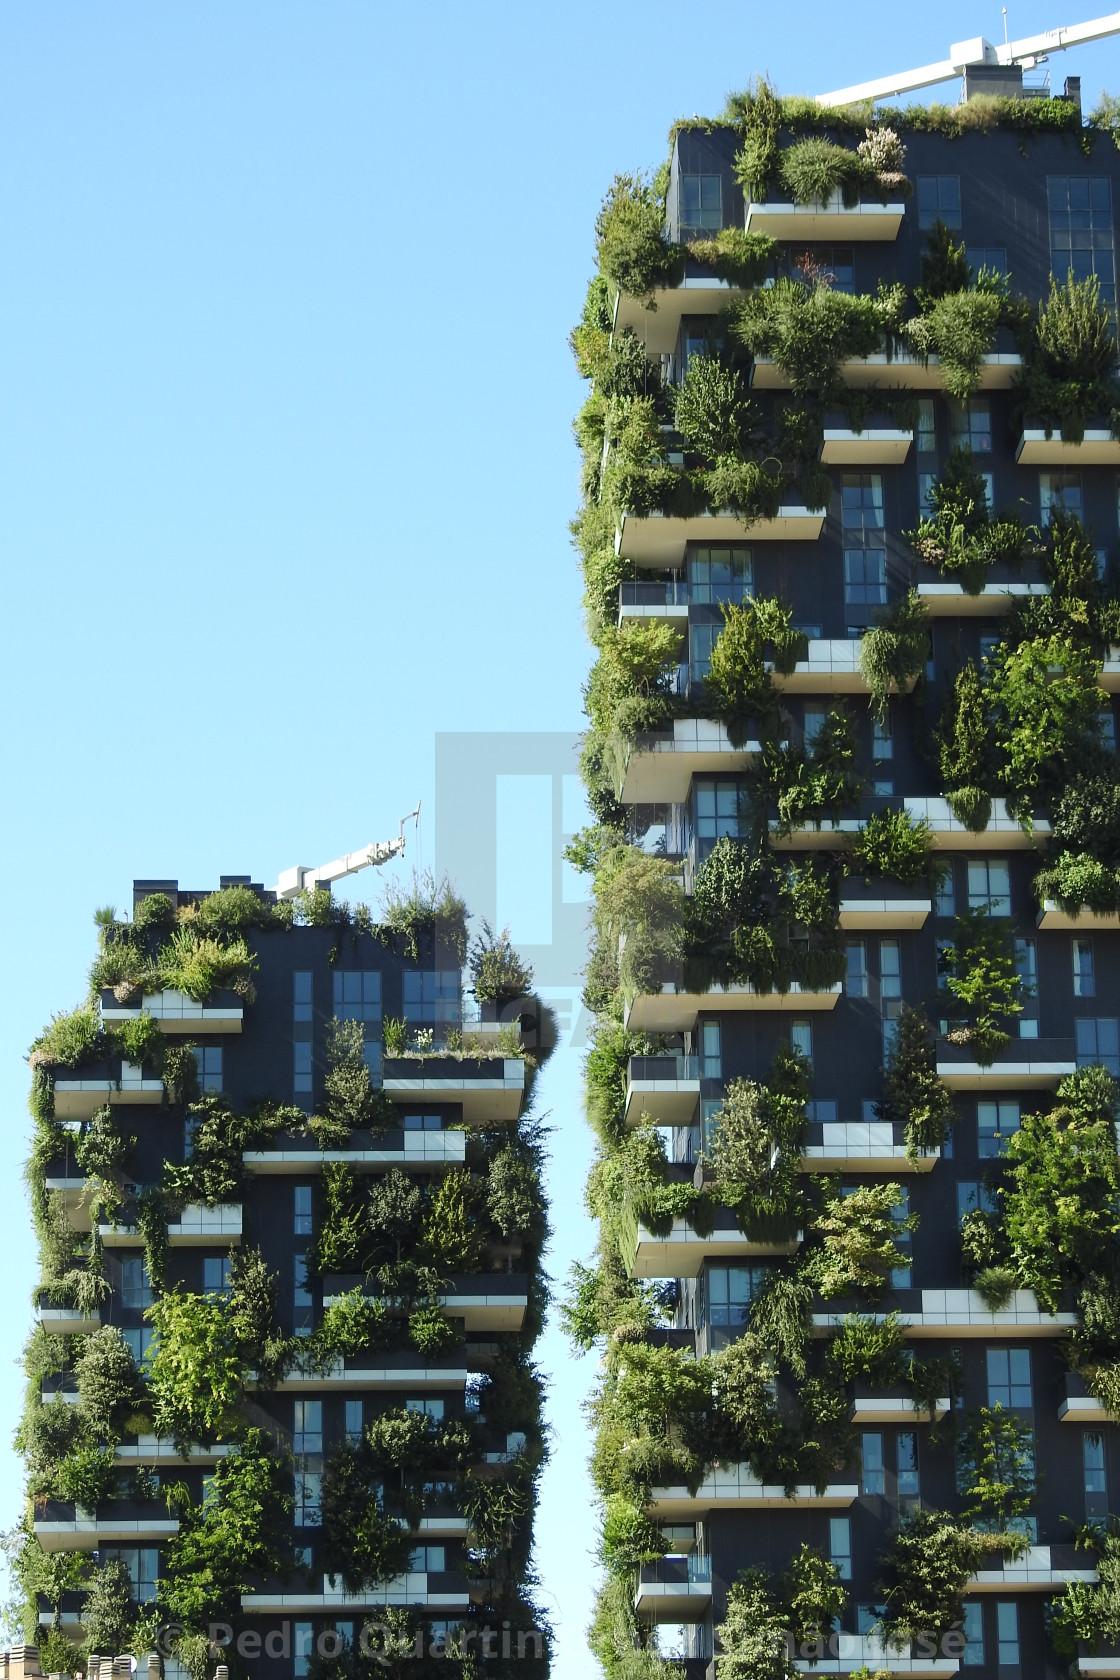 Foto Bosco Verticale Milano bosco verticale, vertical forest, milan, italy - license